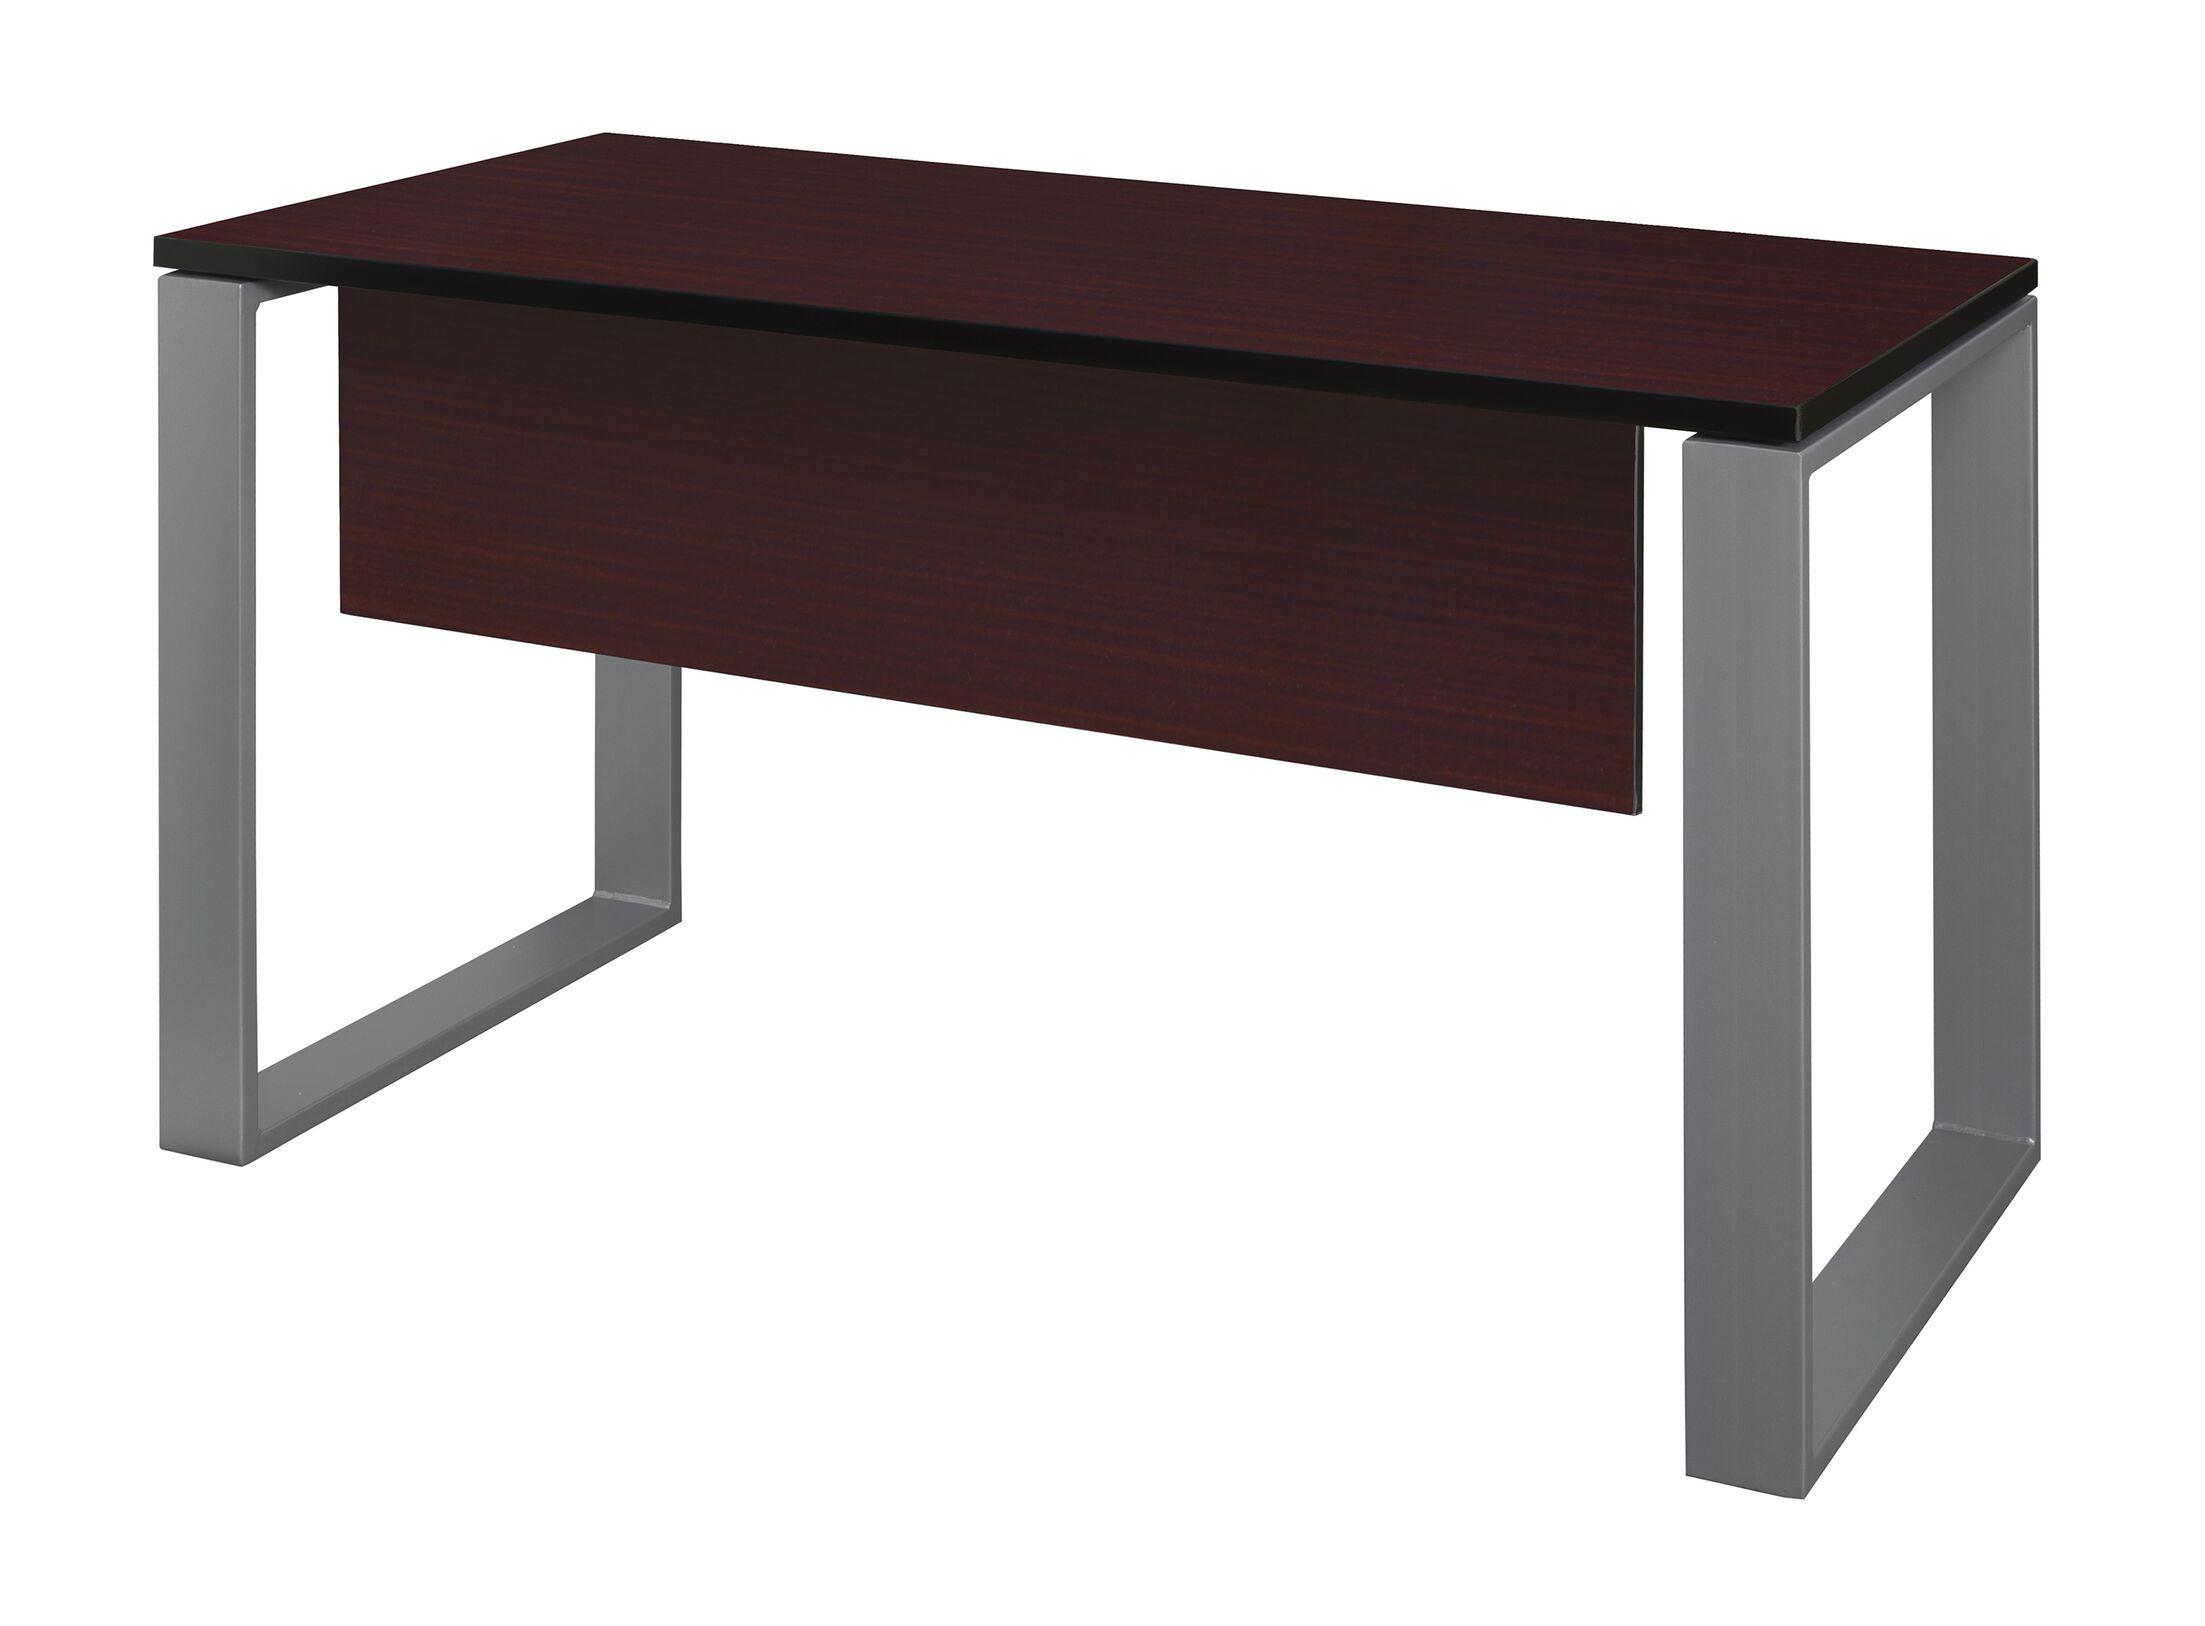 Mireya Training Table with Modesty Panel Base Finish: Gray, Tabletop Finish: Mahogany, Size: 29